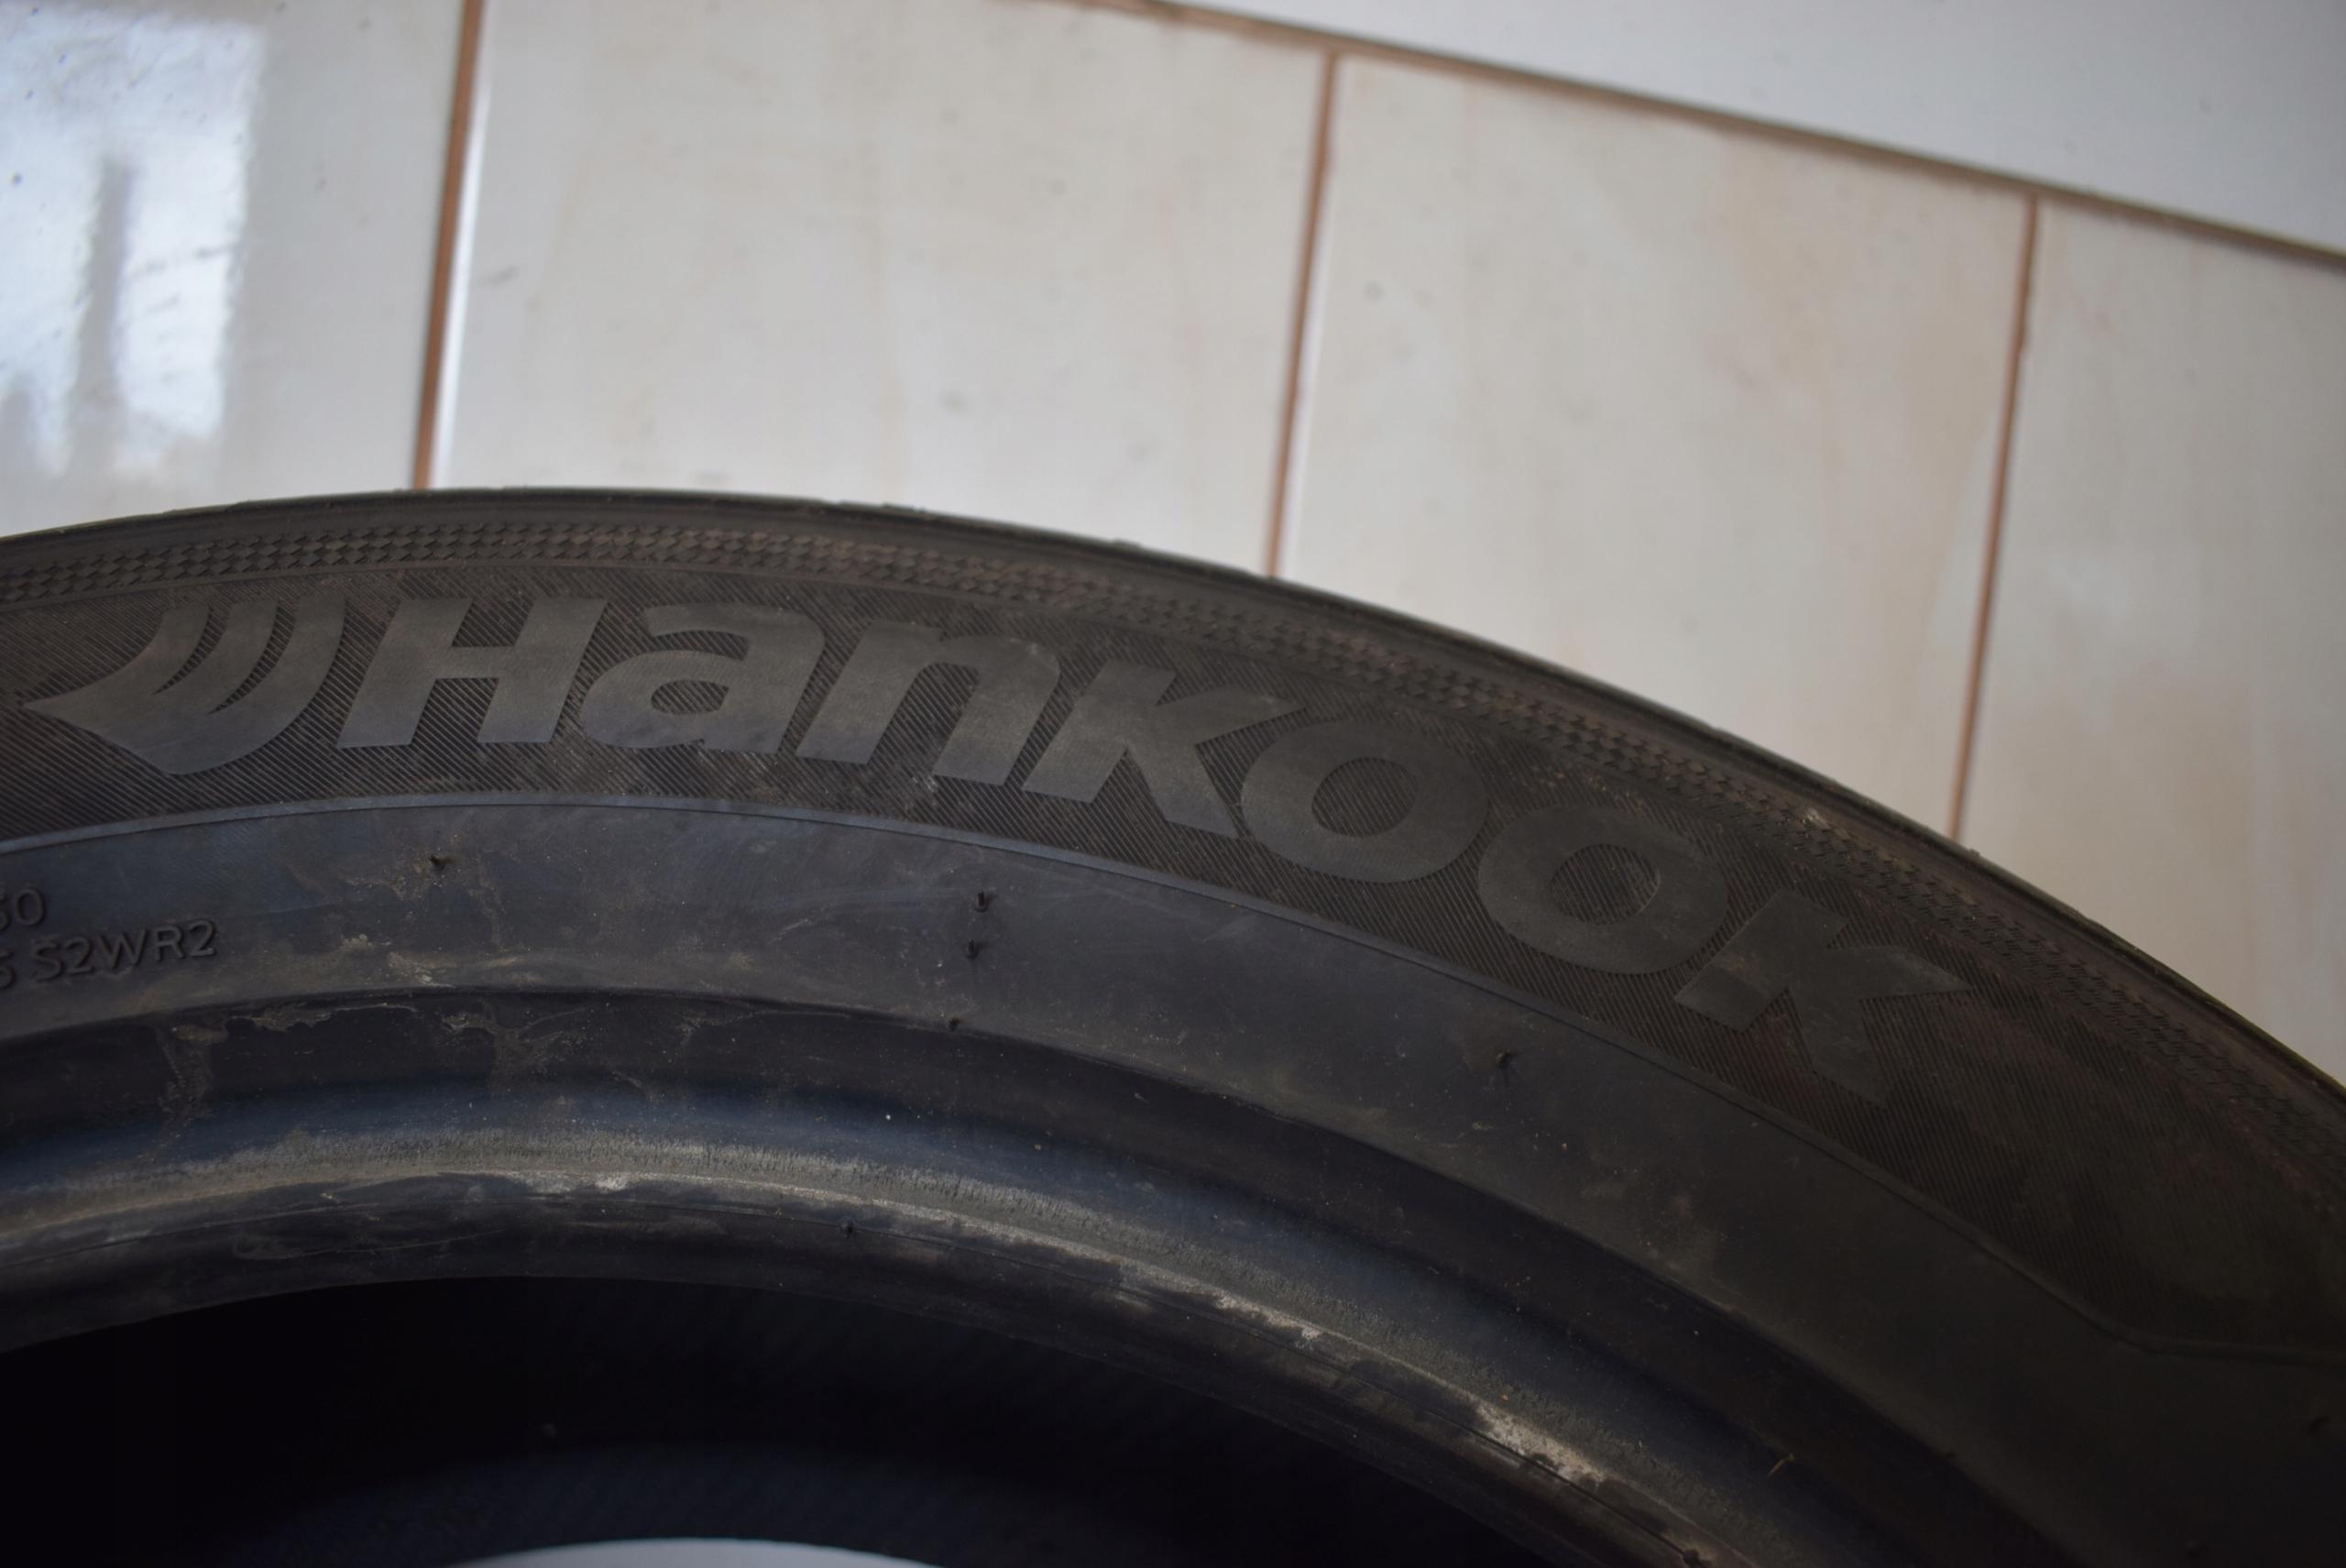 Picture of R17 235/55 103W HANKOOK VENTUS PRIME 3